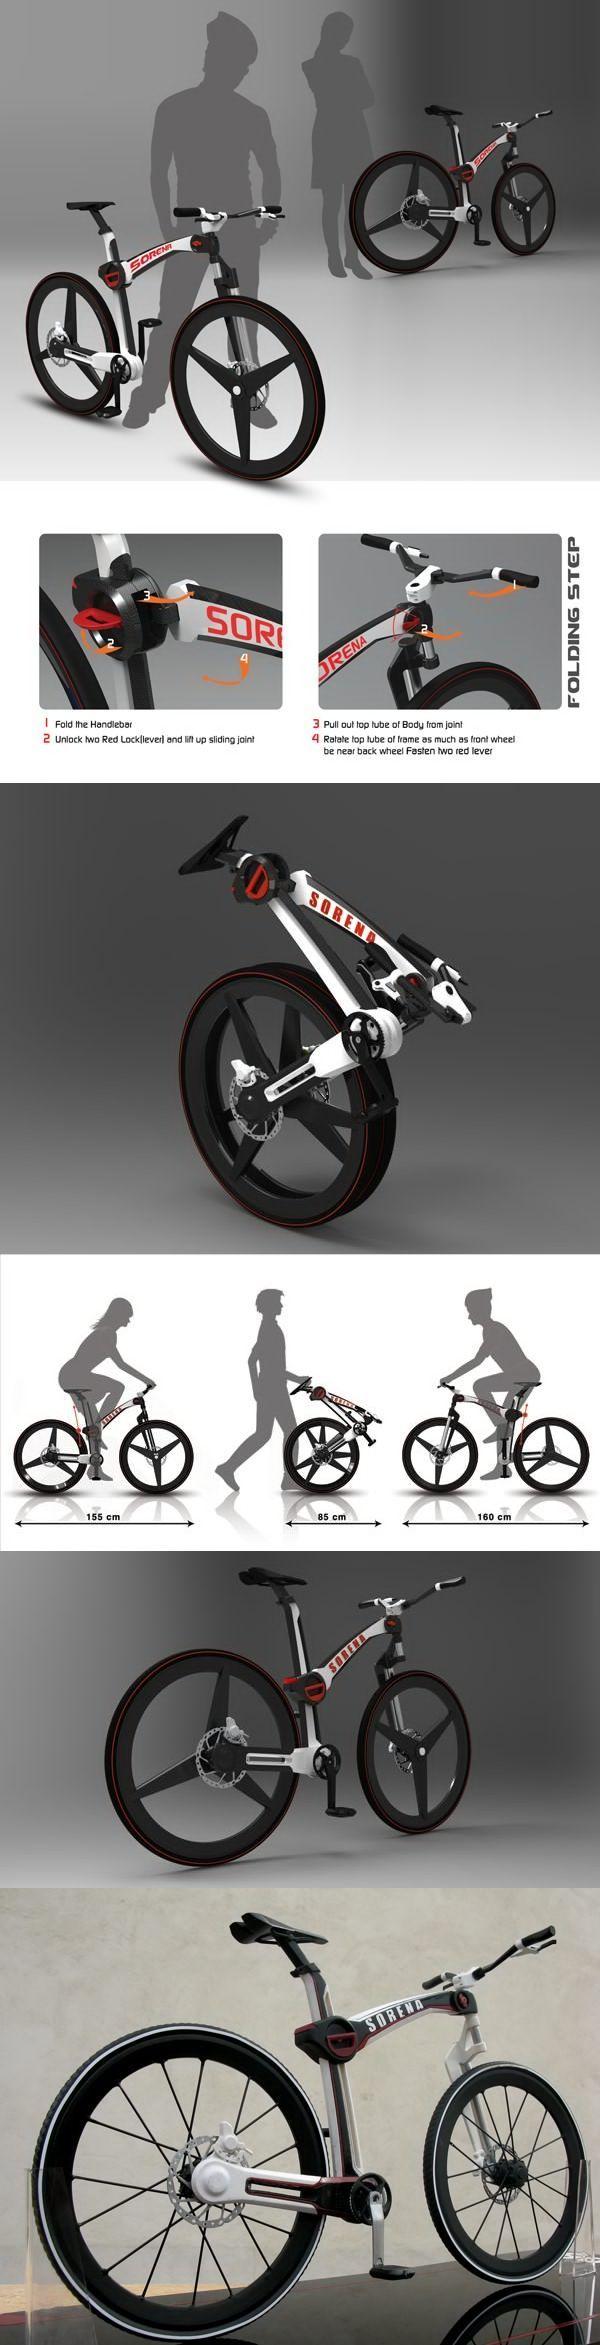 "The ""Sorena"" folding bike concept designer: Mahdi Momeni"